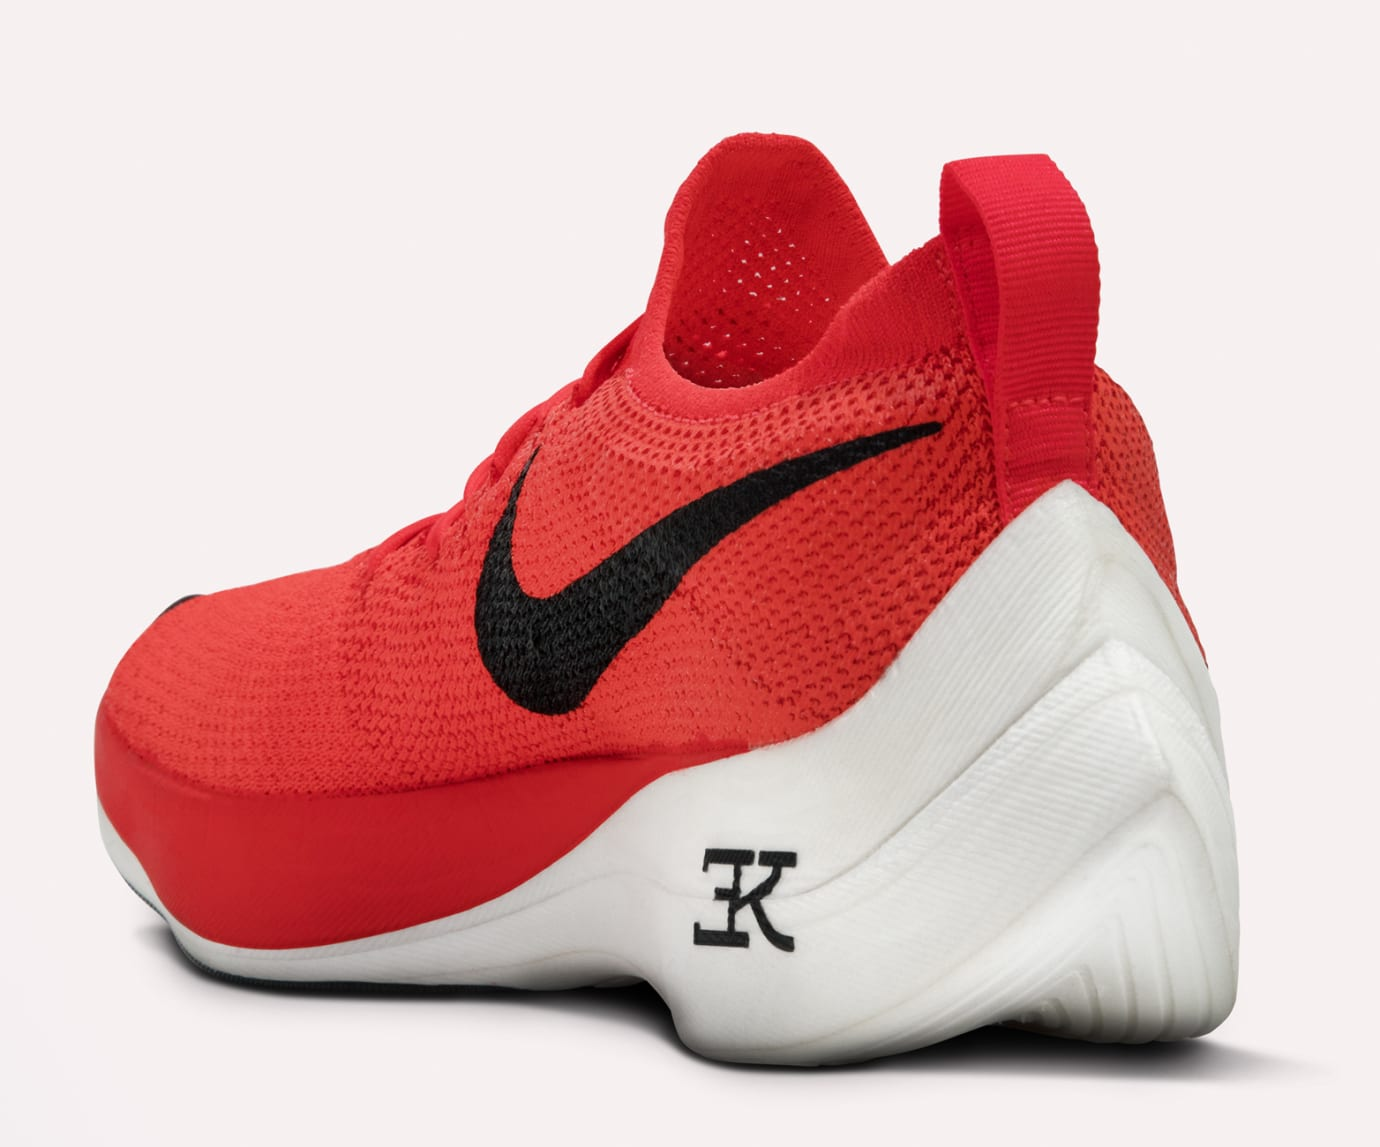 Nike Zoom VaporFly Elite Heel